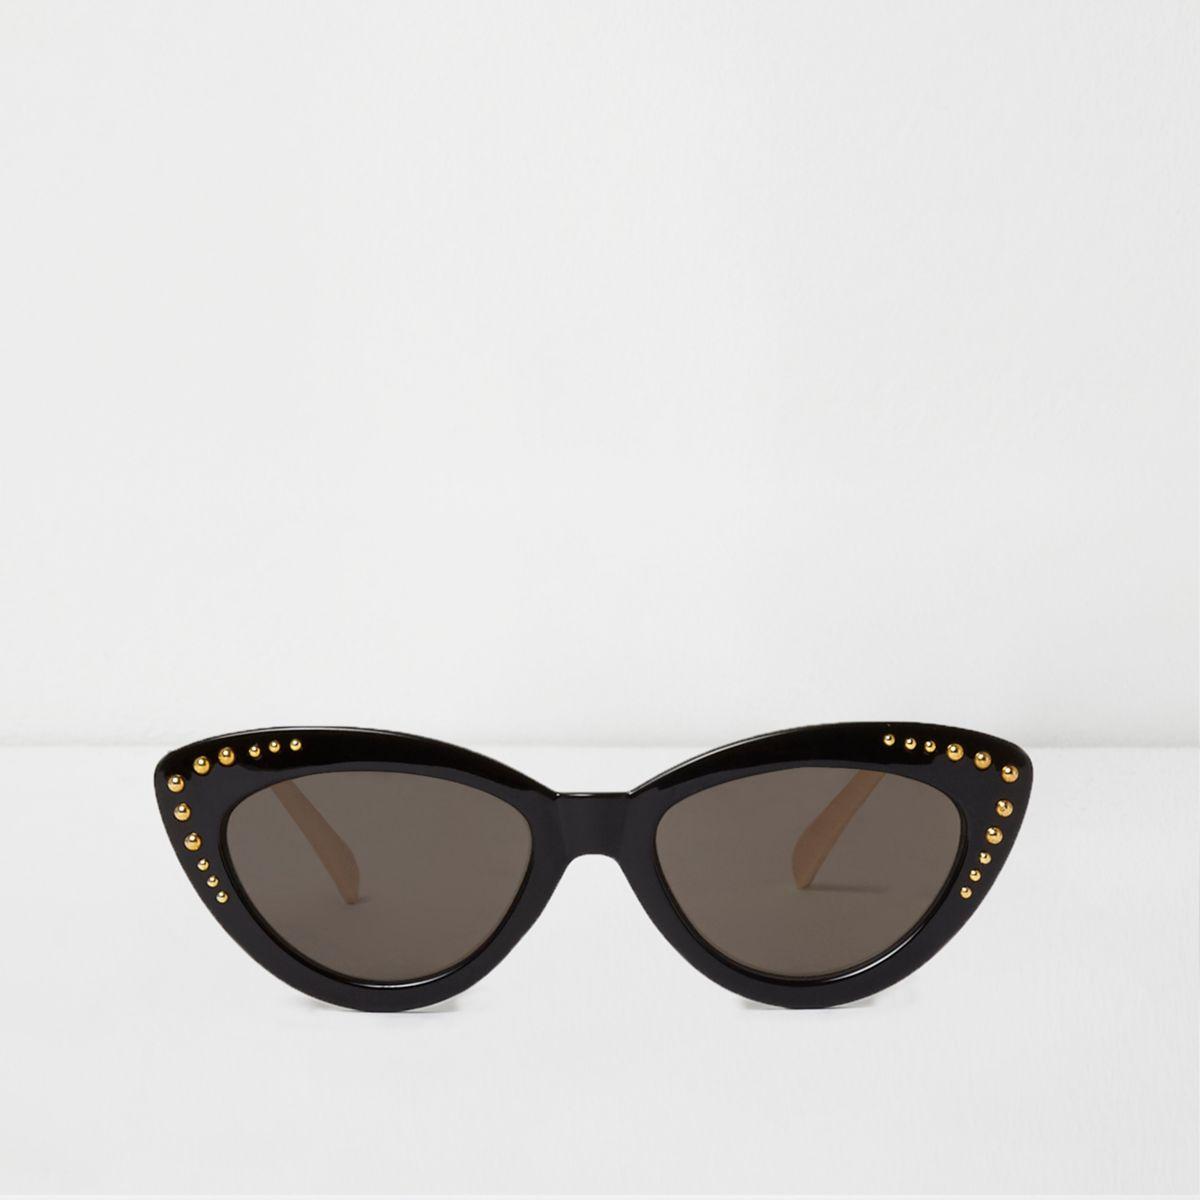 Black studded cat eye sunglasses